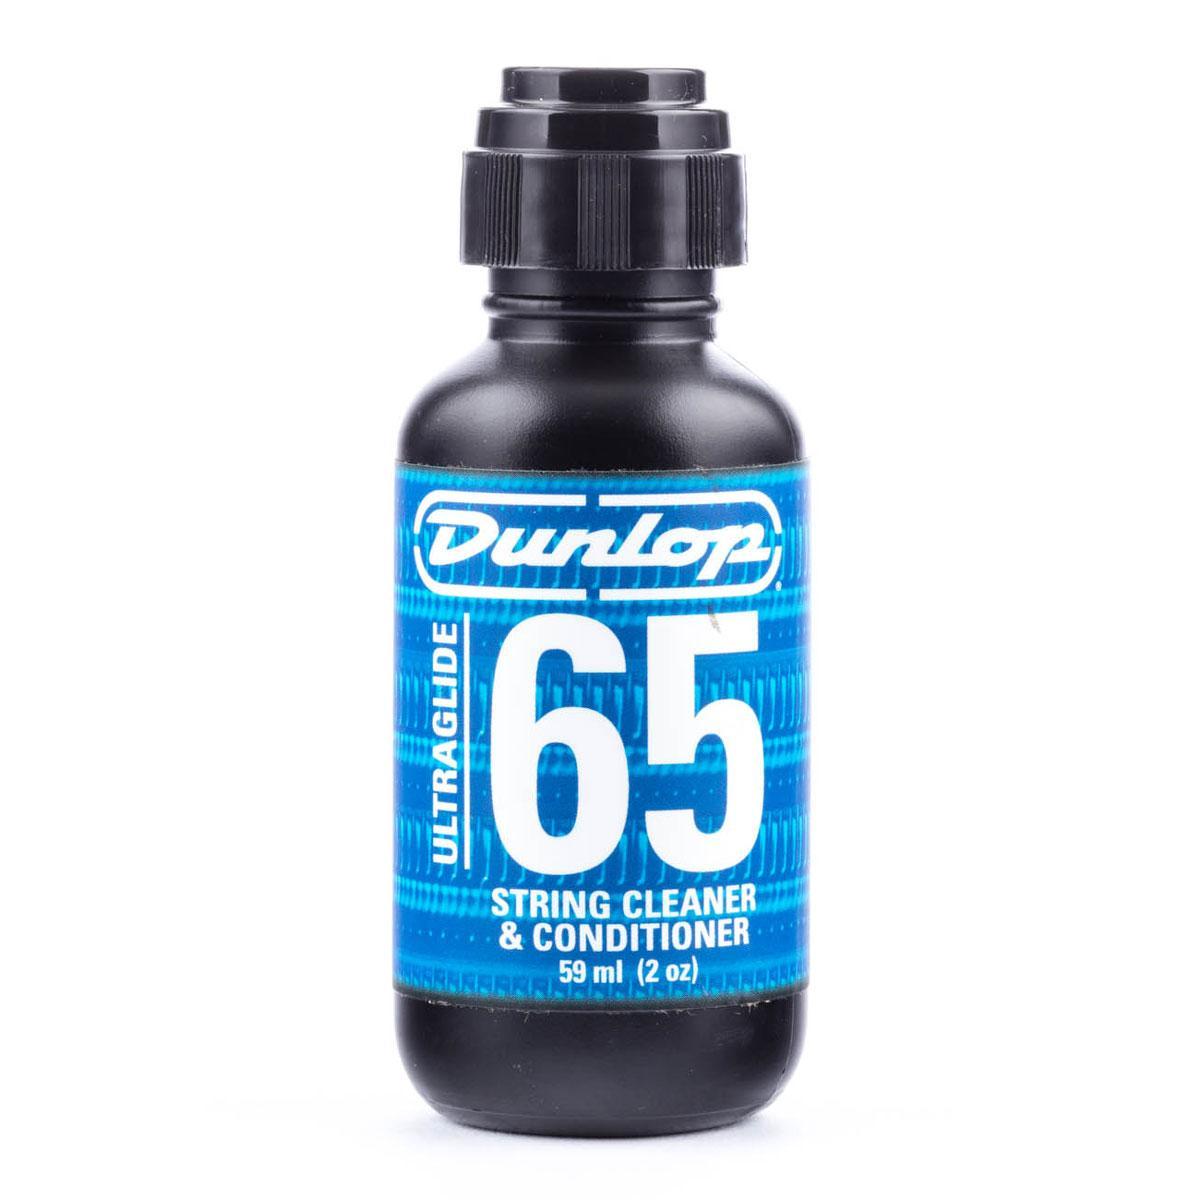 Очищувач-кондиціонер для струн DUNLOP 6582 Ultraglide 65 String Cleaner & Conditioner